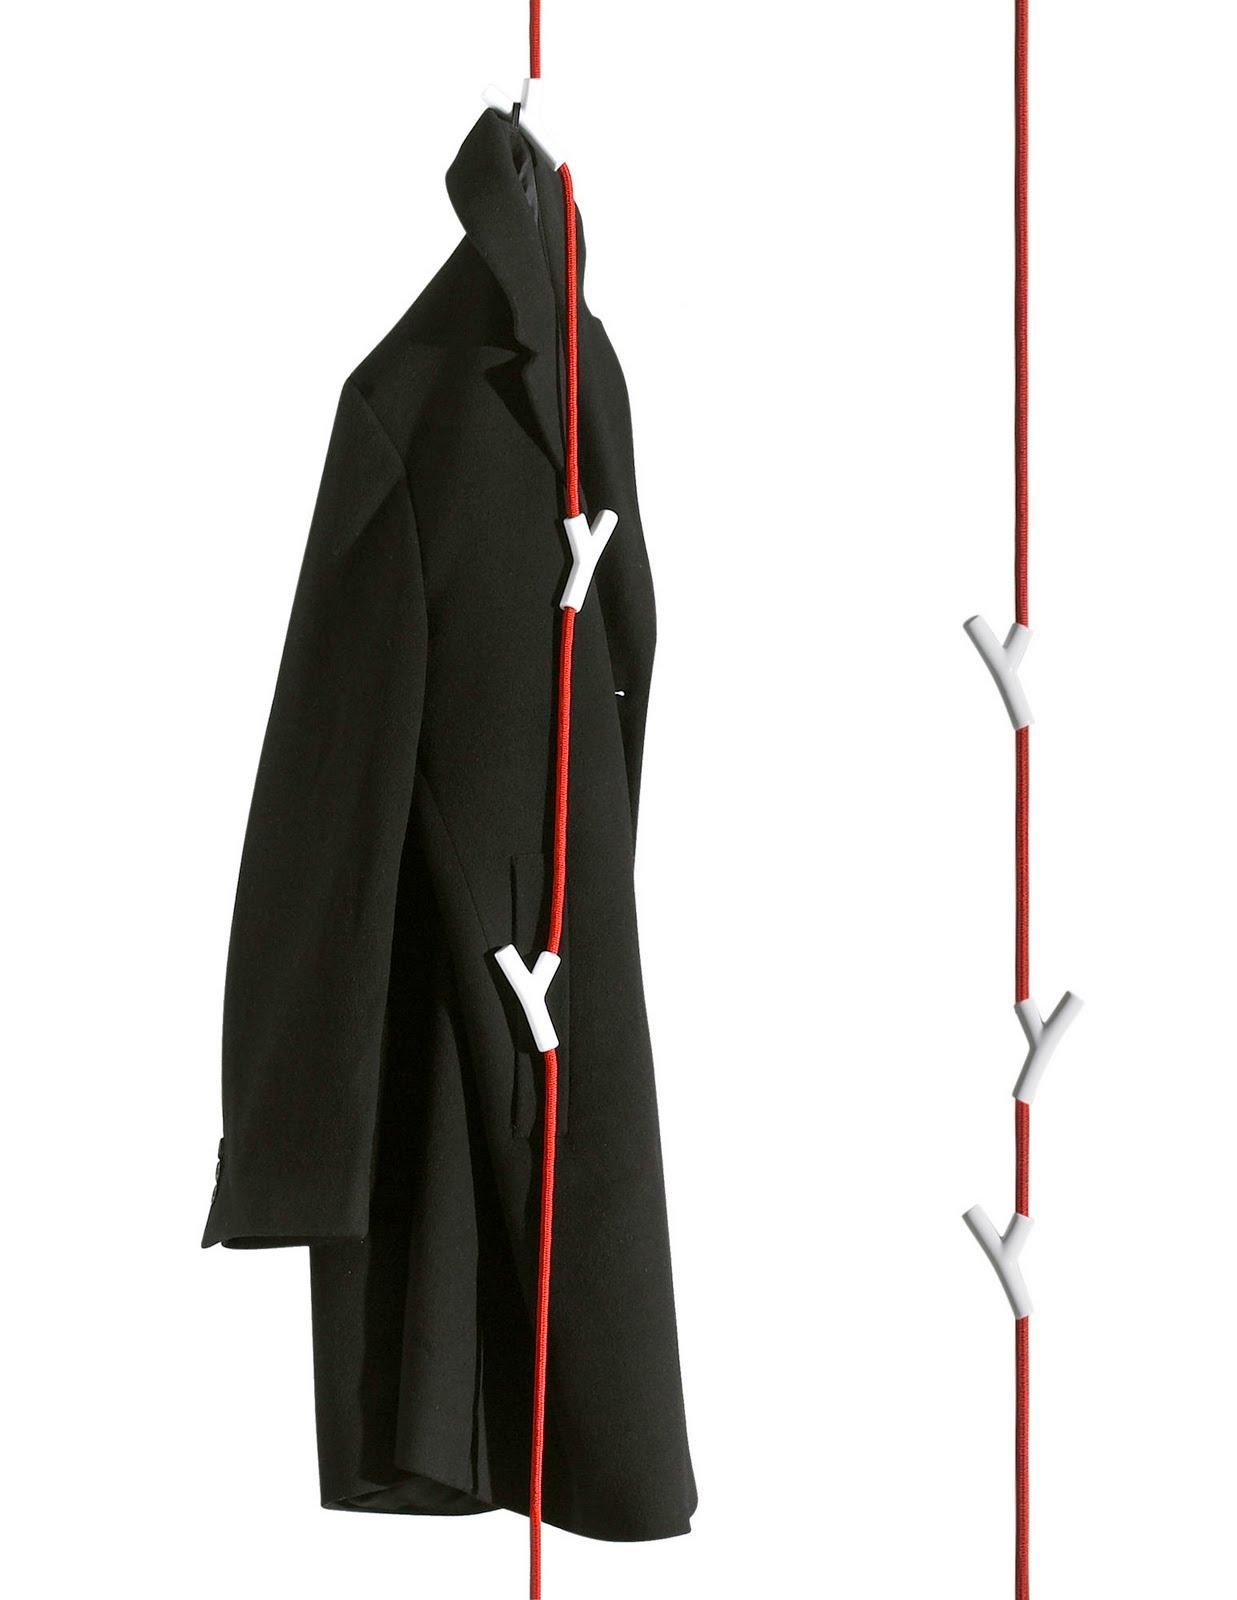 15 Creative Wall Hooks and Unusual Coat Racks - Part 4.